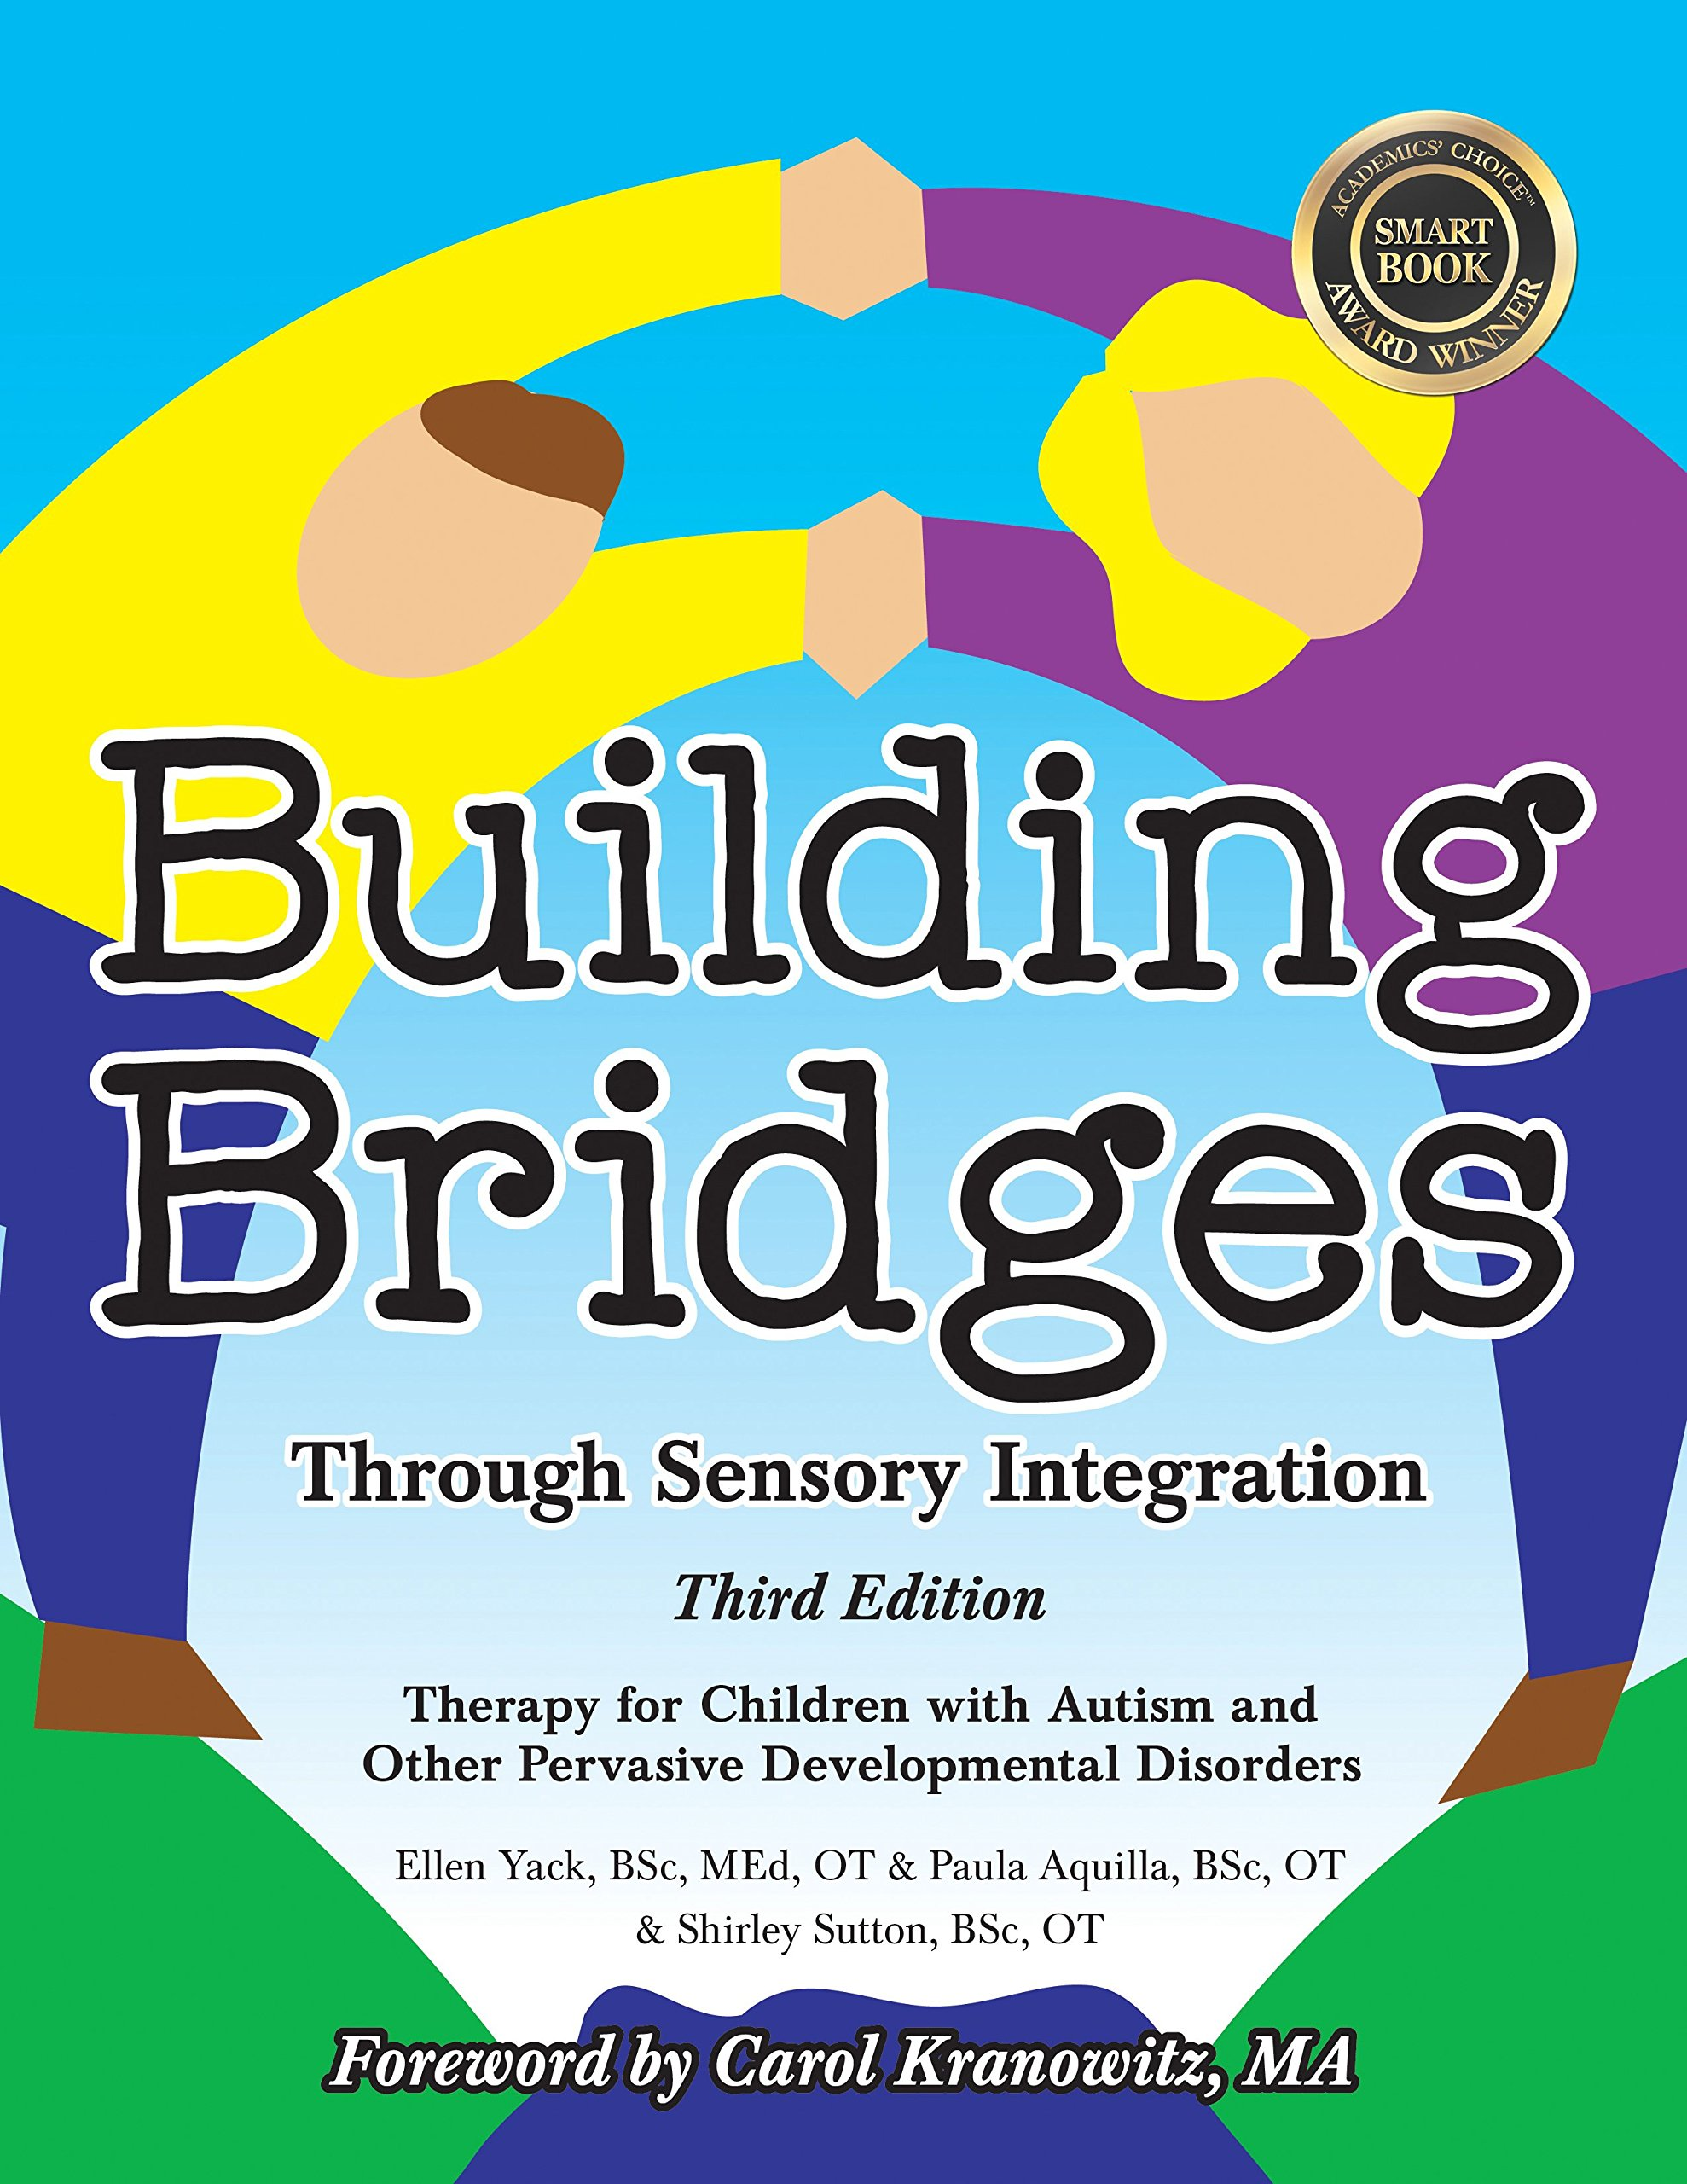 The Third Edition of Building Bridges Through Sensory Integration - Co-Authored by Ellen Yack